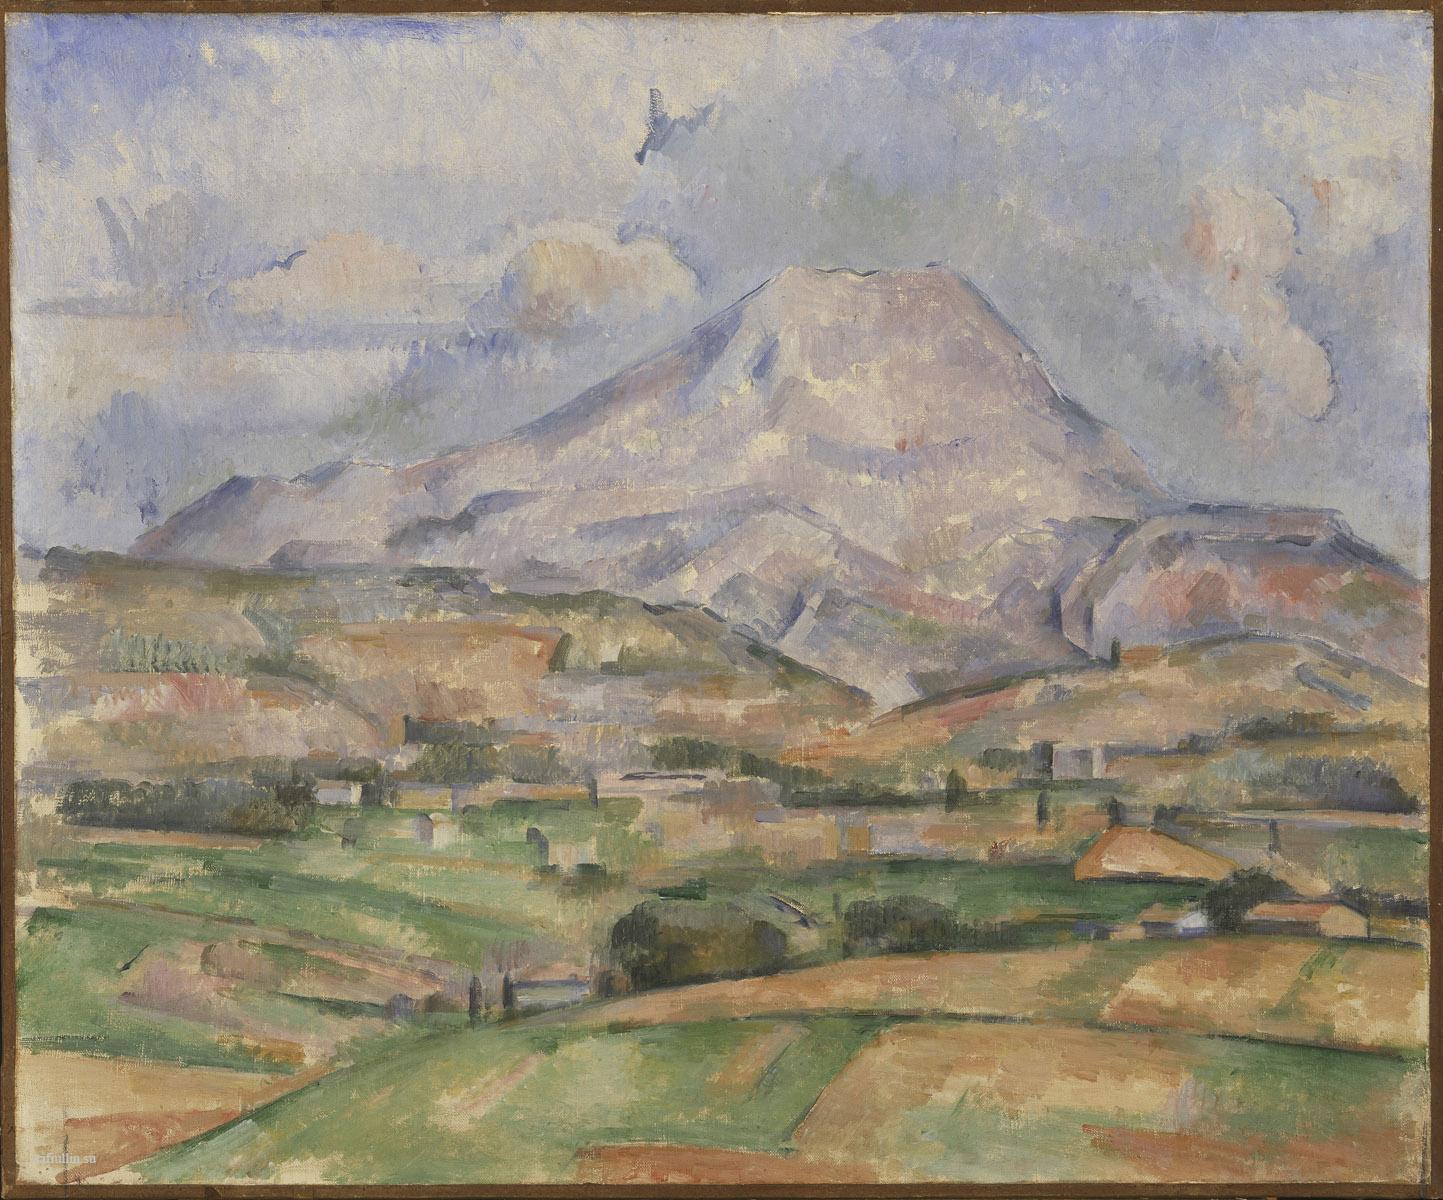 Сезанн картина Montagne Sainte Victoire 1888 пейзажи природы Сафиуллин